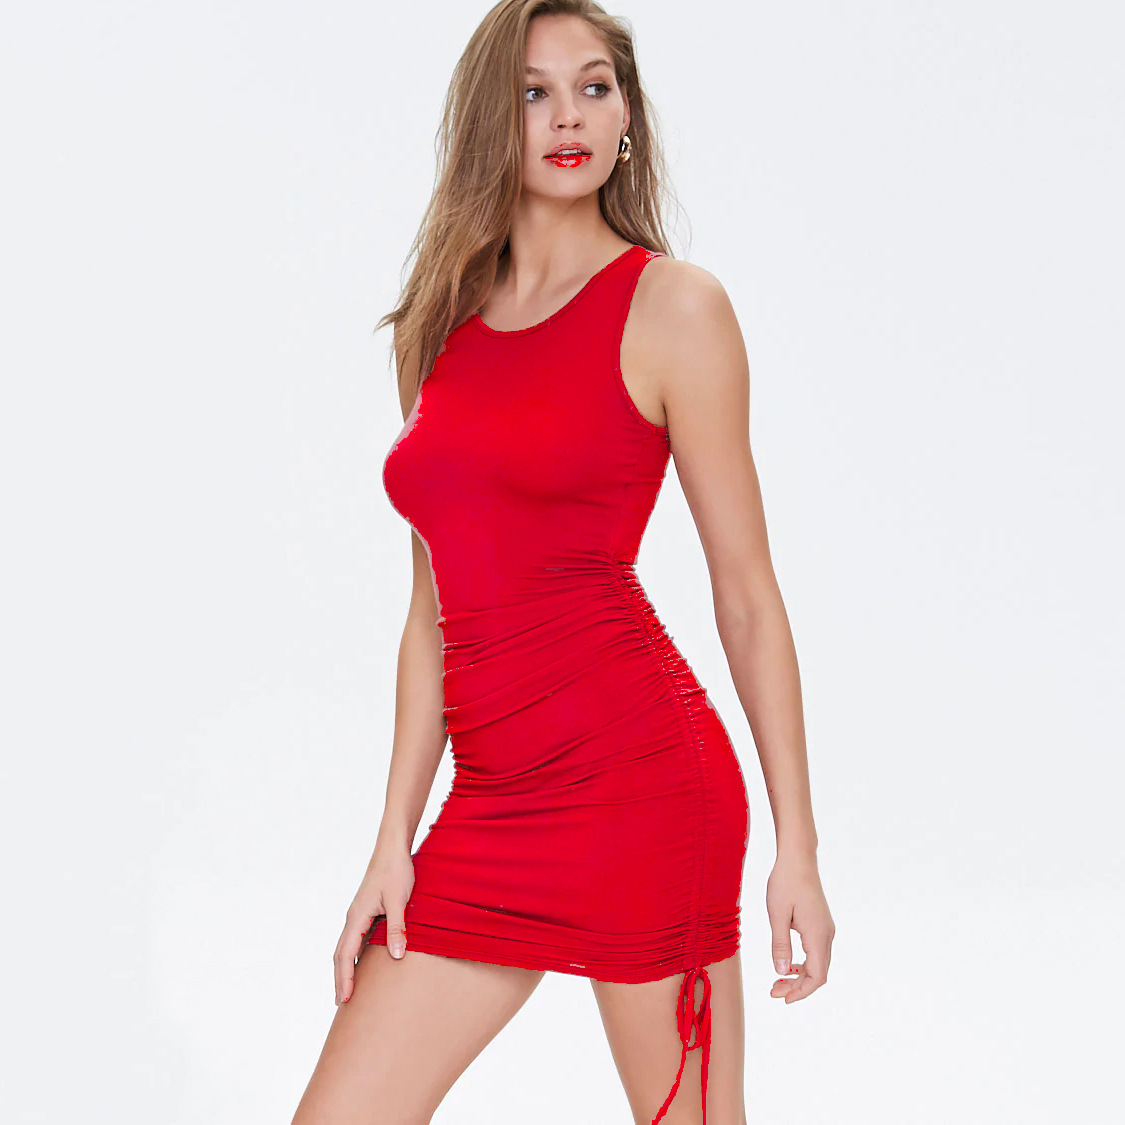 Ladies ribbed drawstring dress bodycon round neck short-sleeve sexy T-shirt dresses WL88 7